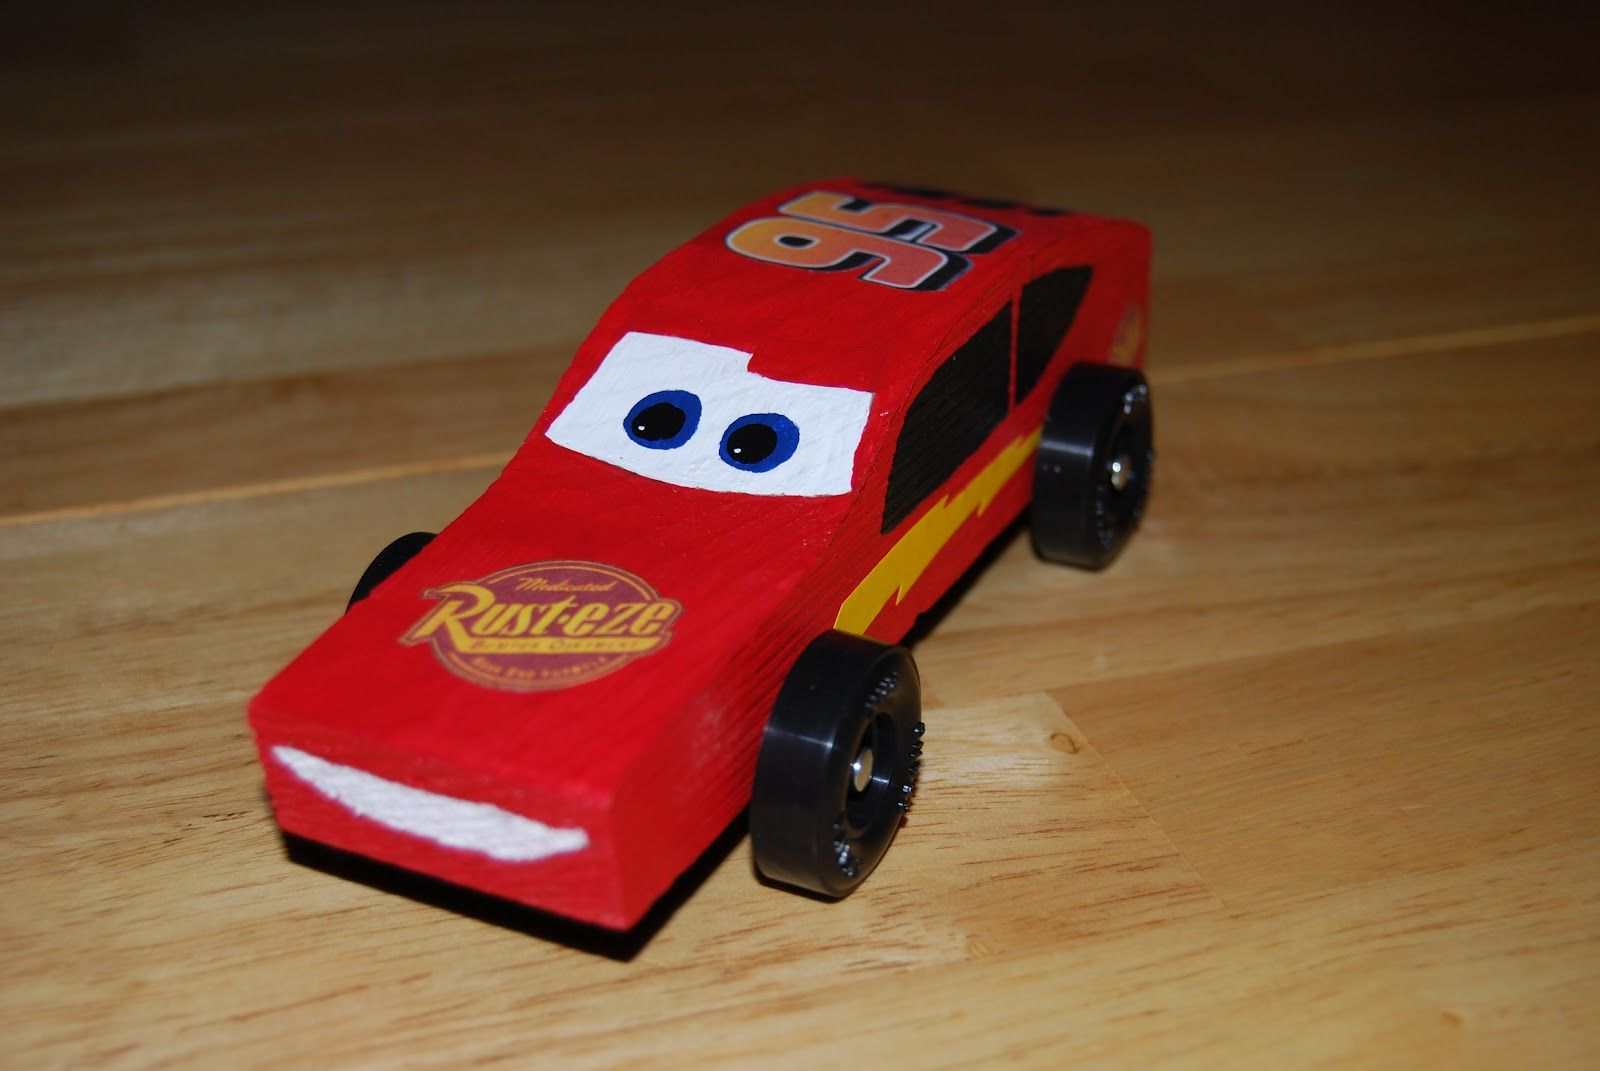 Awana Grand Prix Car Designs